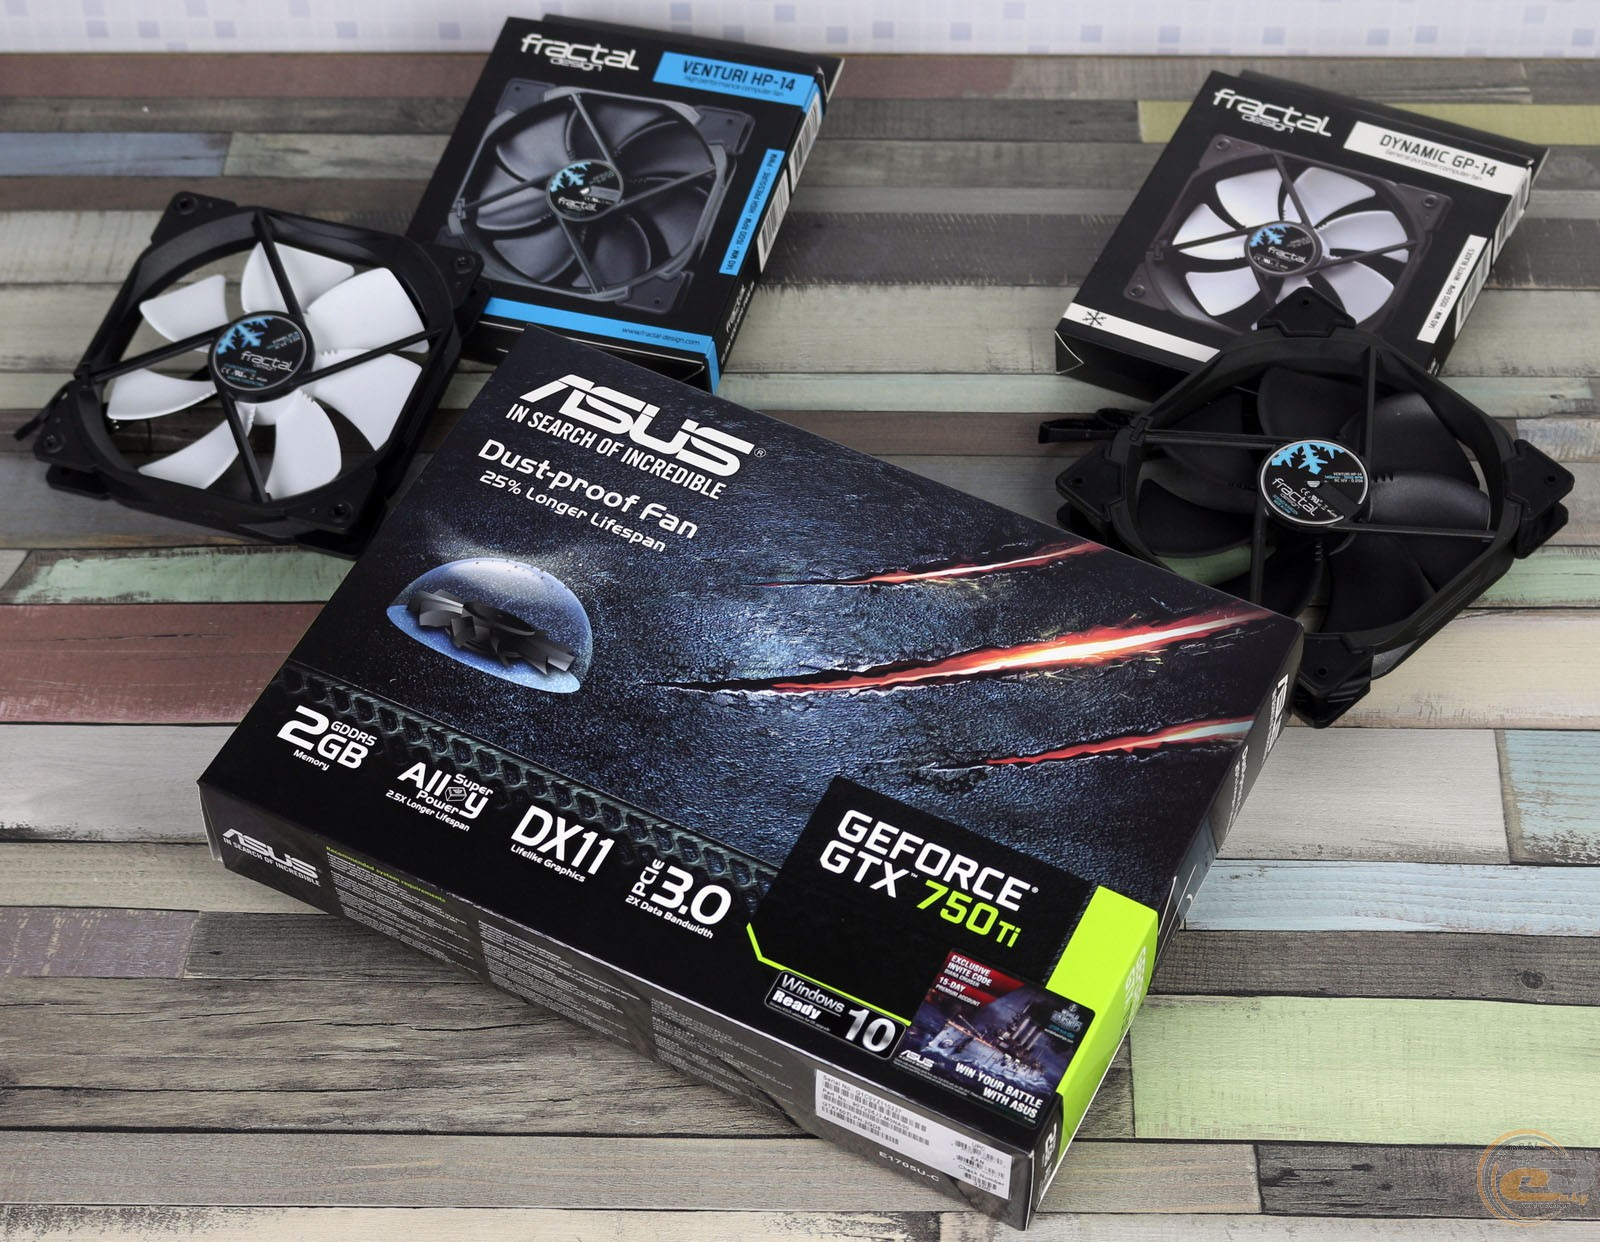 Asus Geforce GTX 750 Ti драйвера